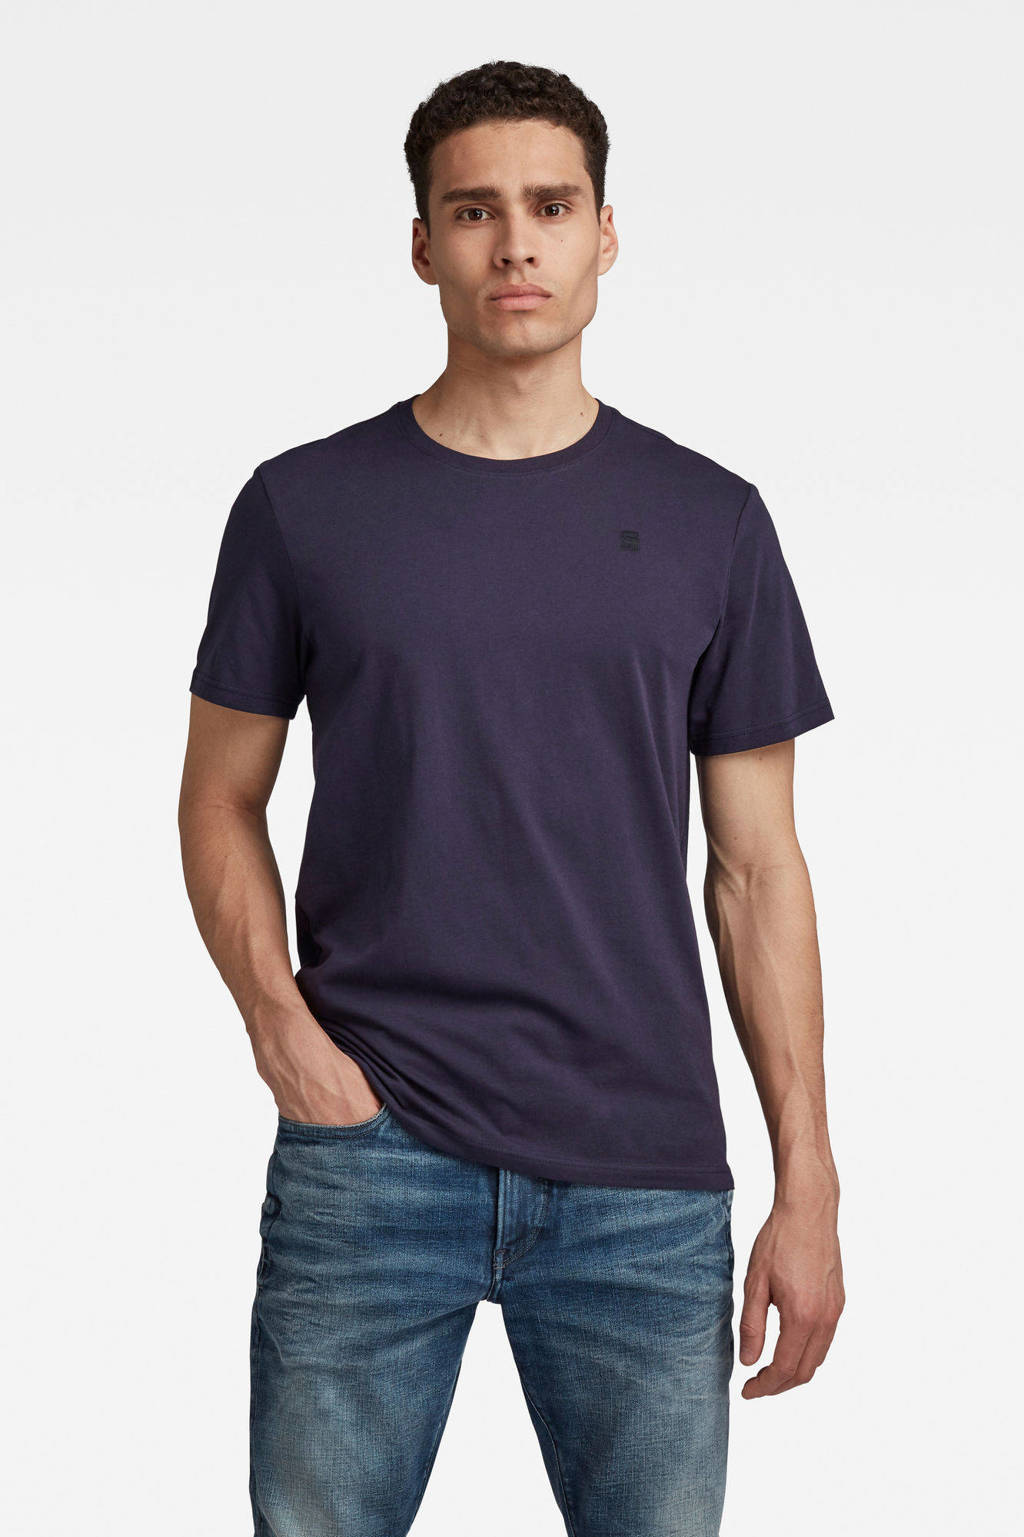 G-Star RAW T-shirt van biologisch katoen sartho blue, SARTHO BLUE